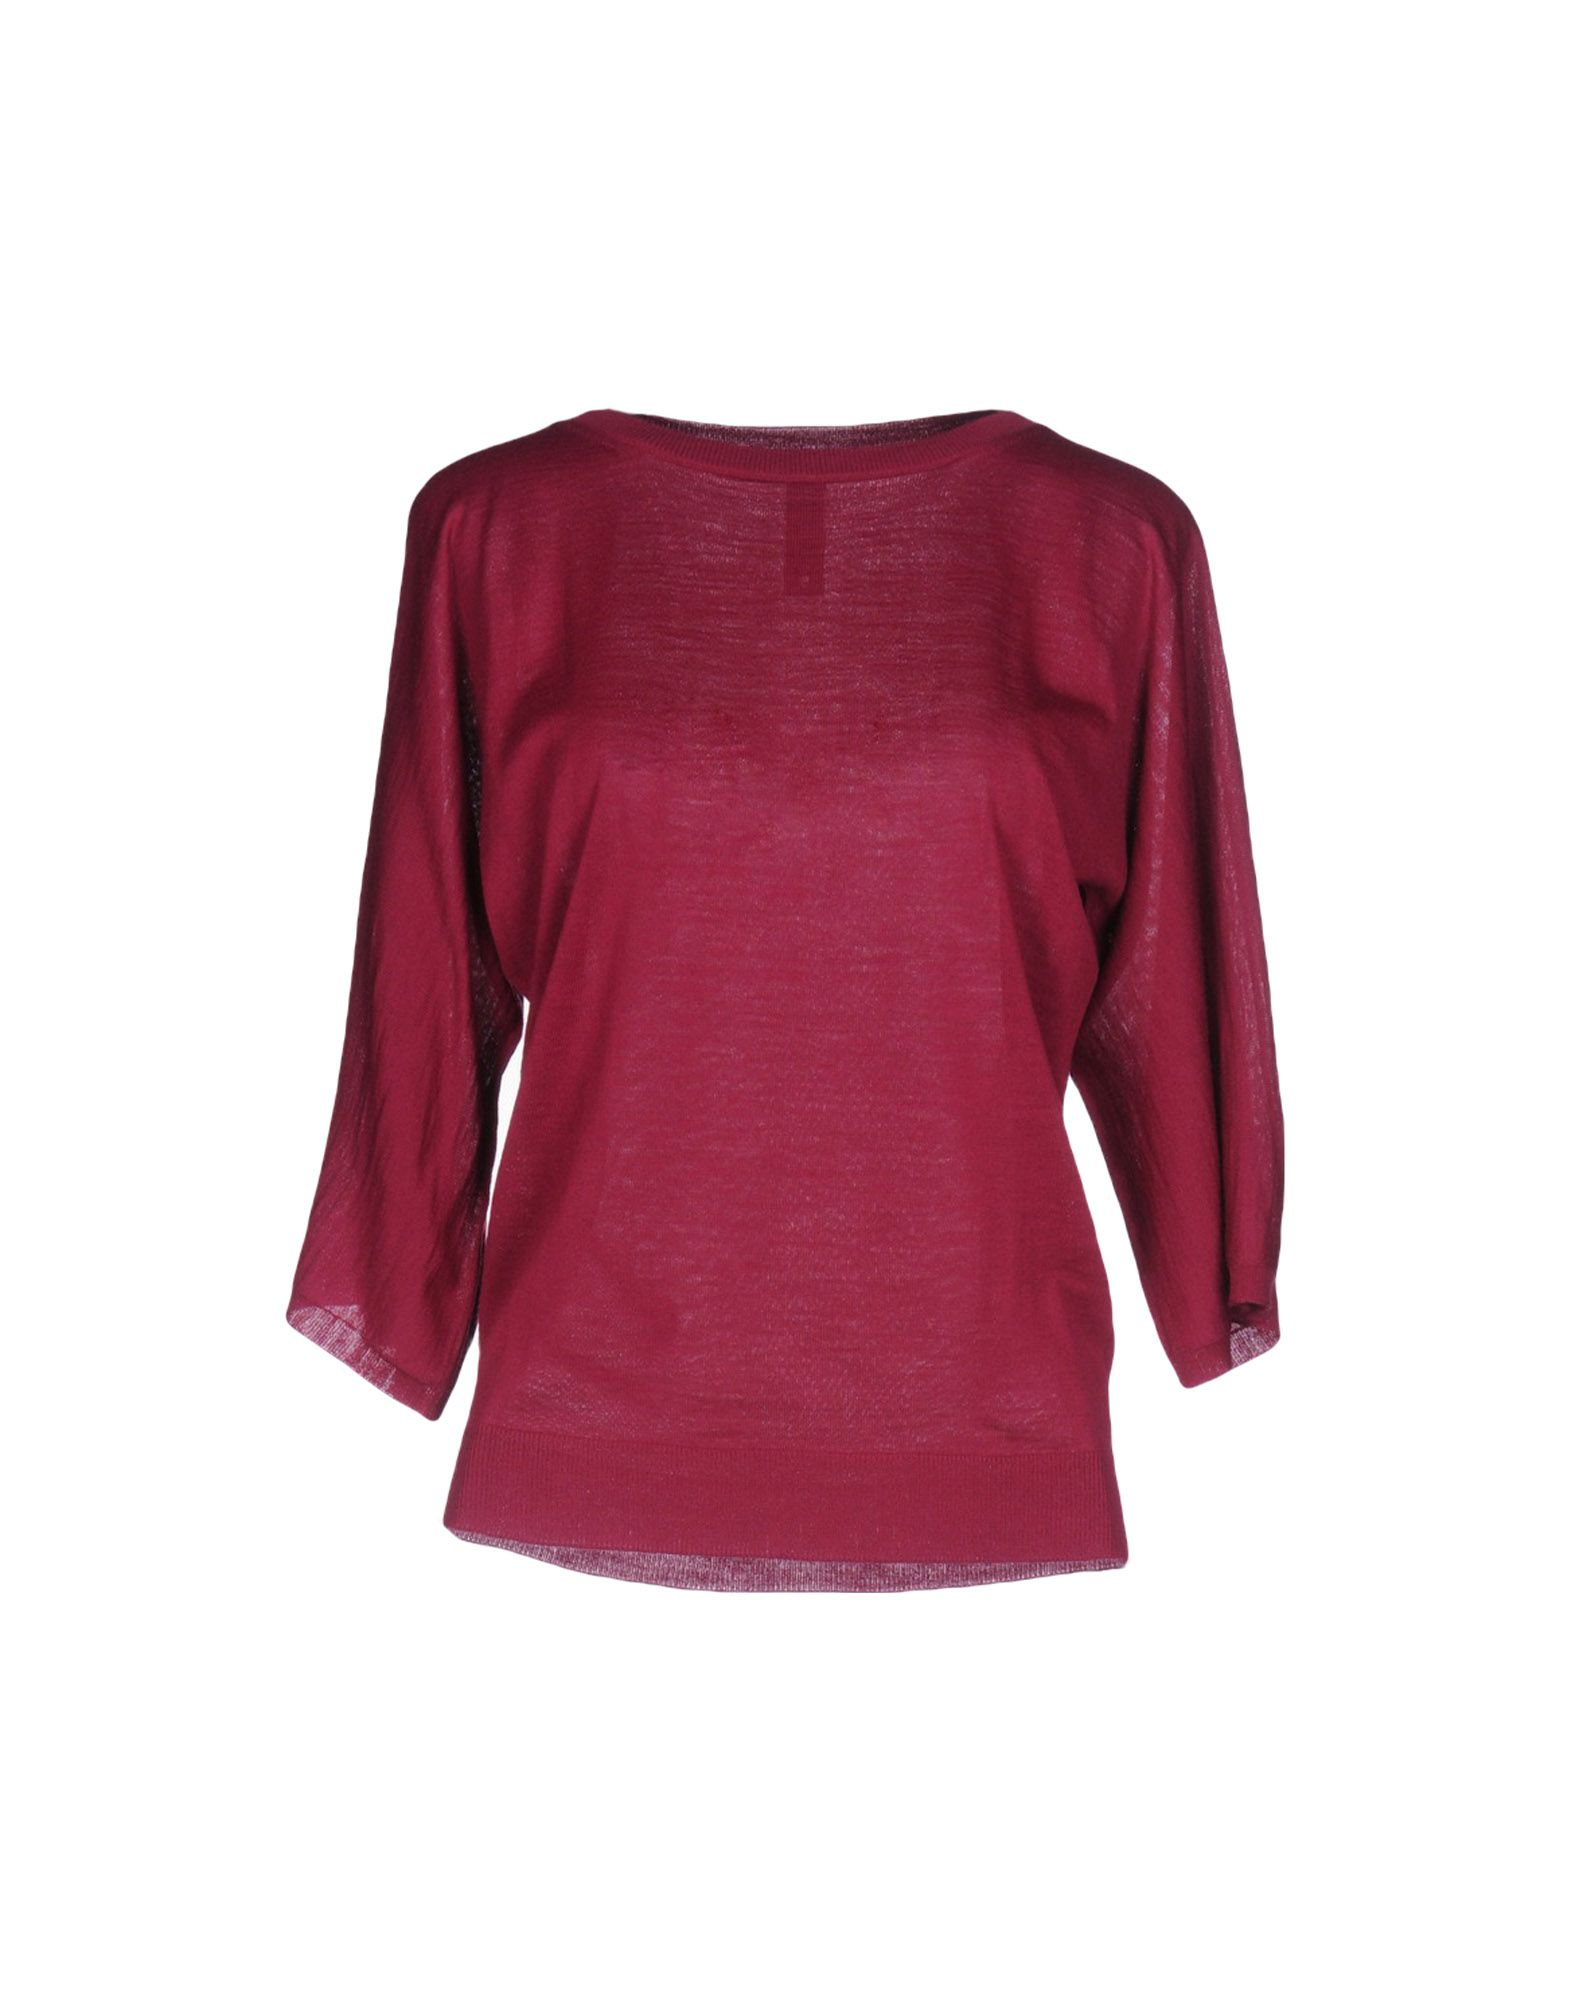 PIANURASTUDIO Damen Pullover Farbe Purpur Größe 6